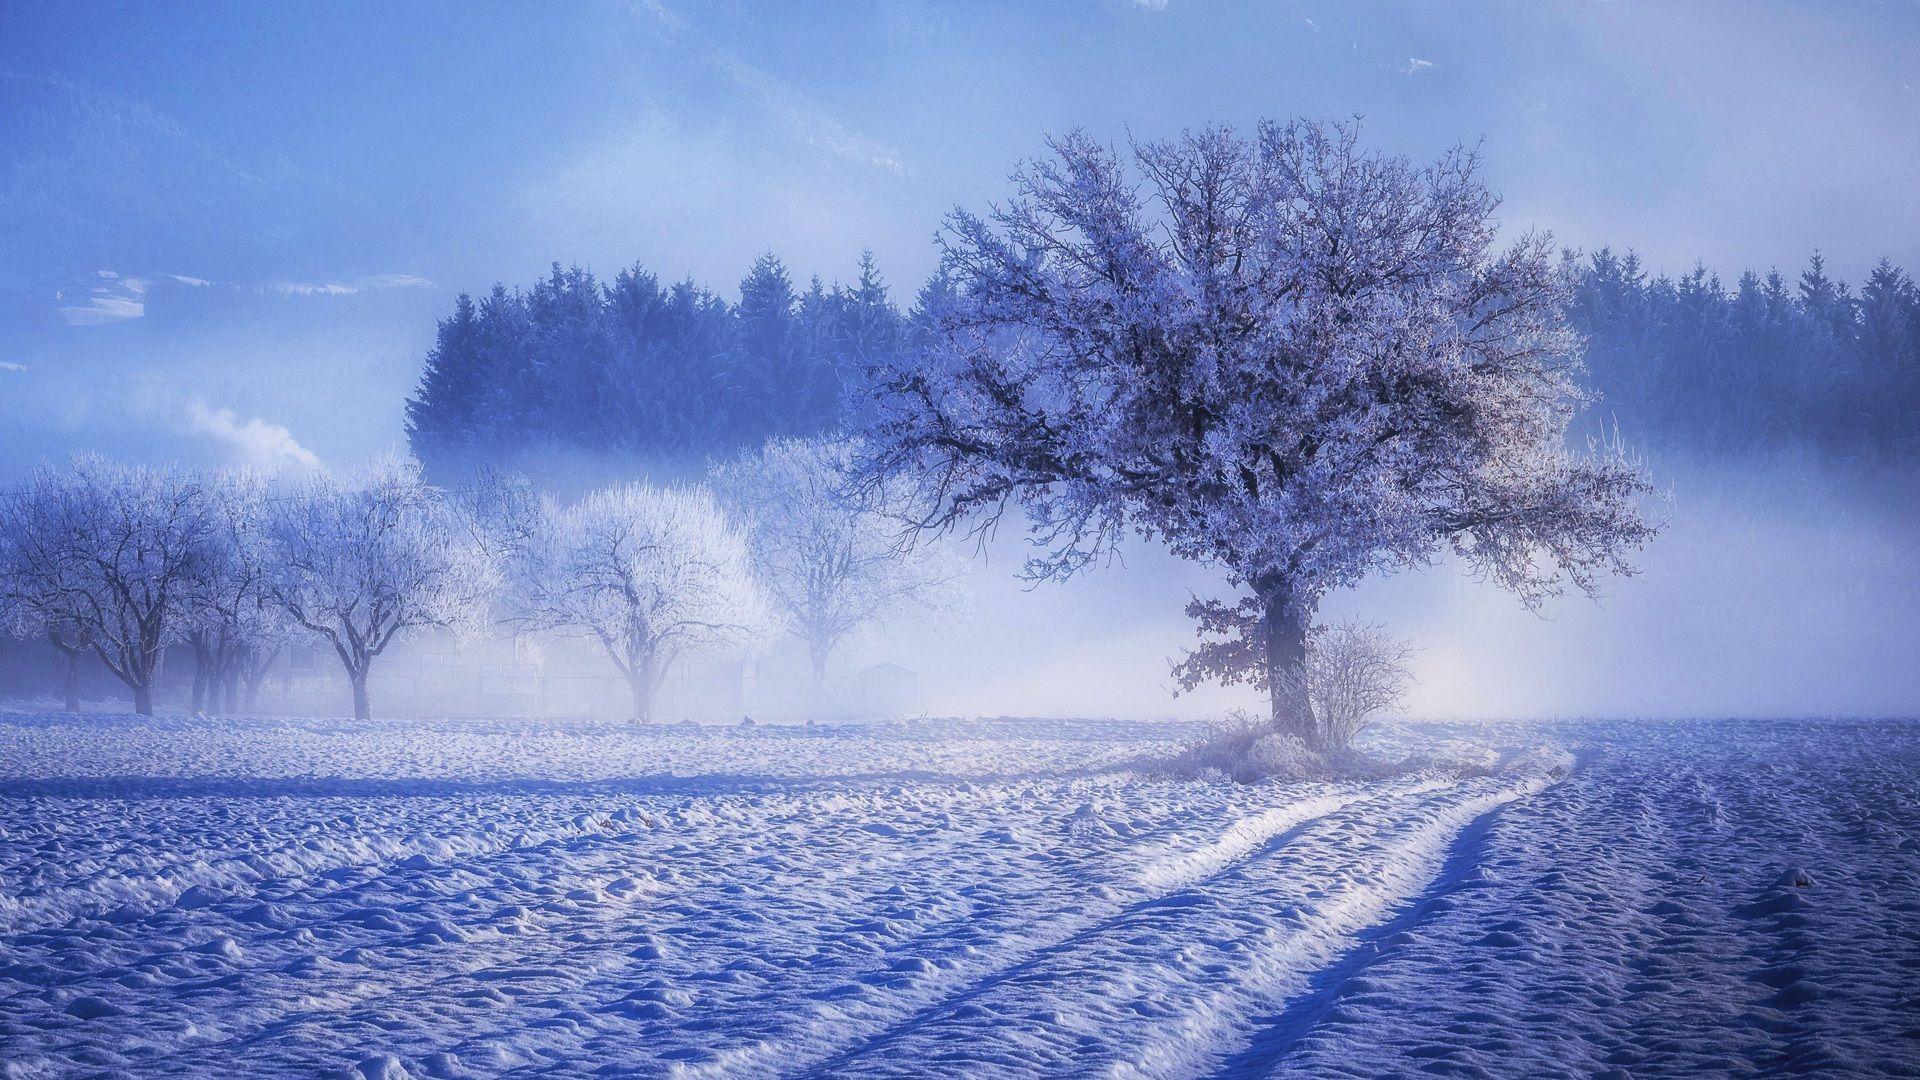 Happy Winter wallpaper photo full hd